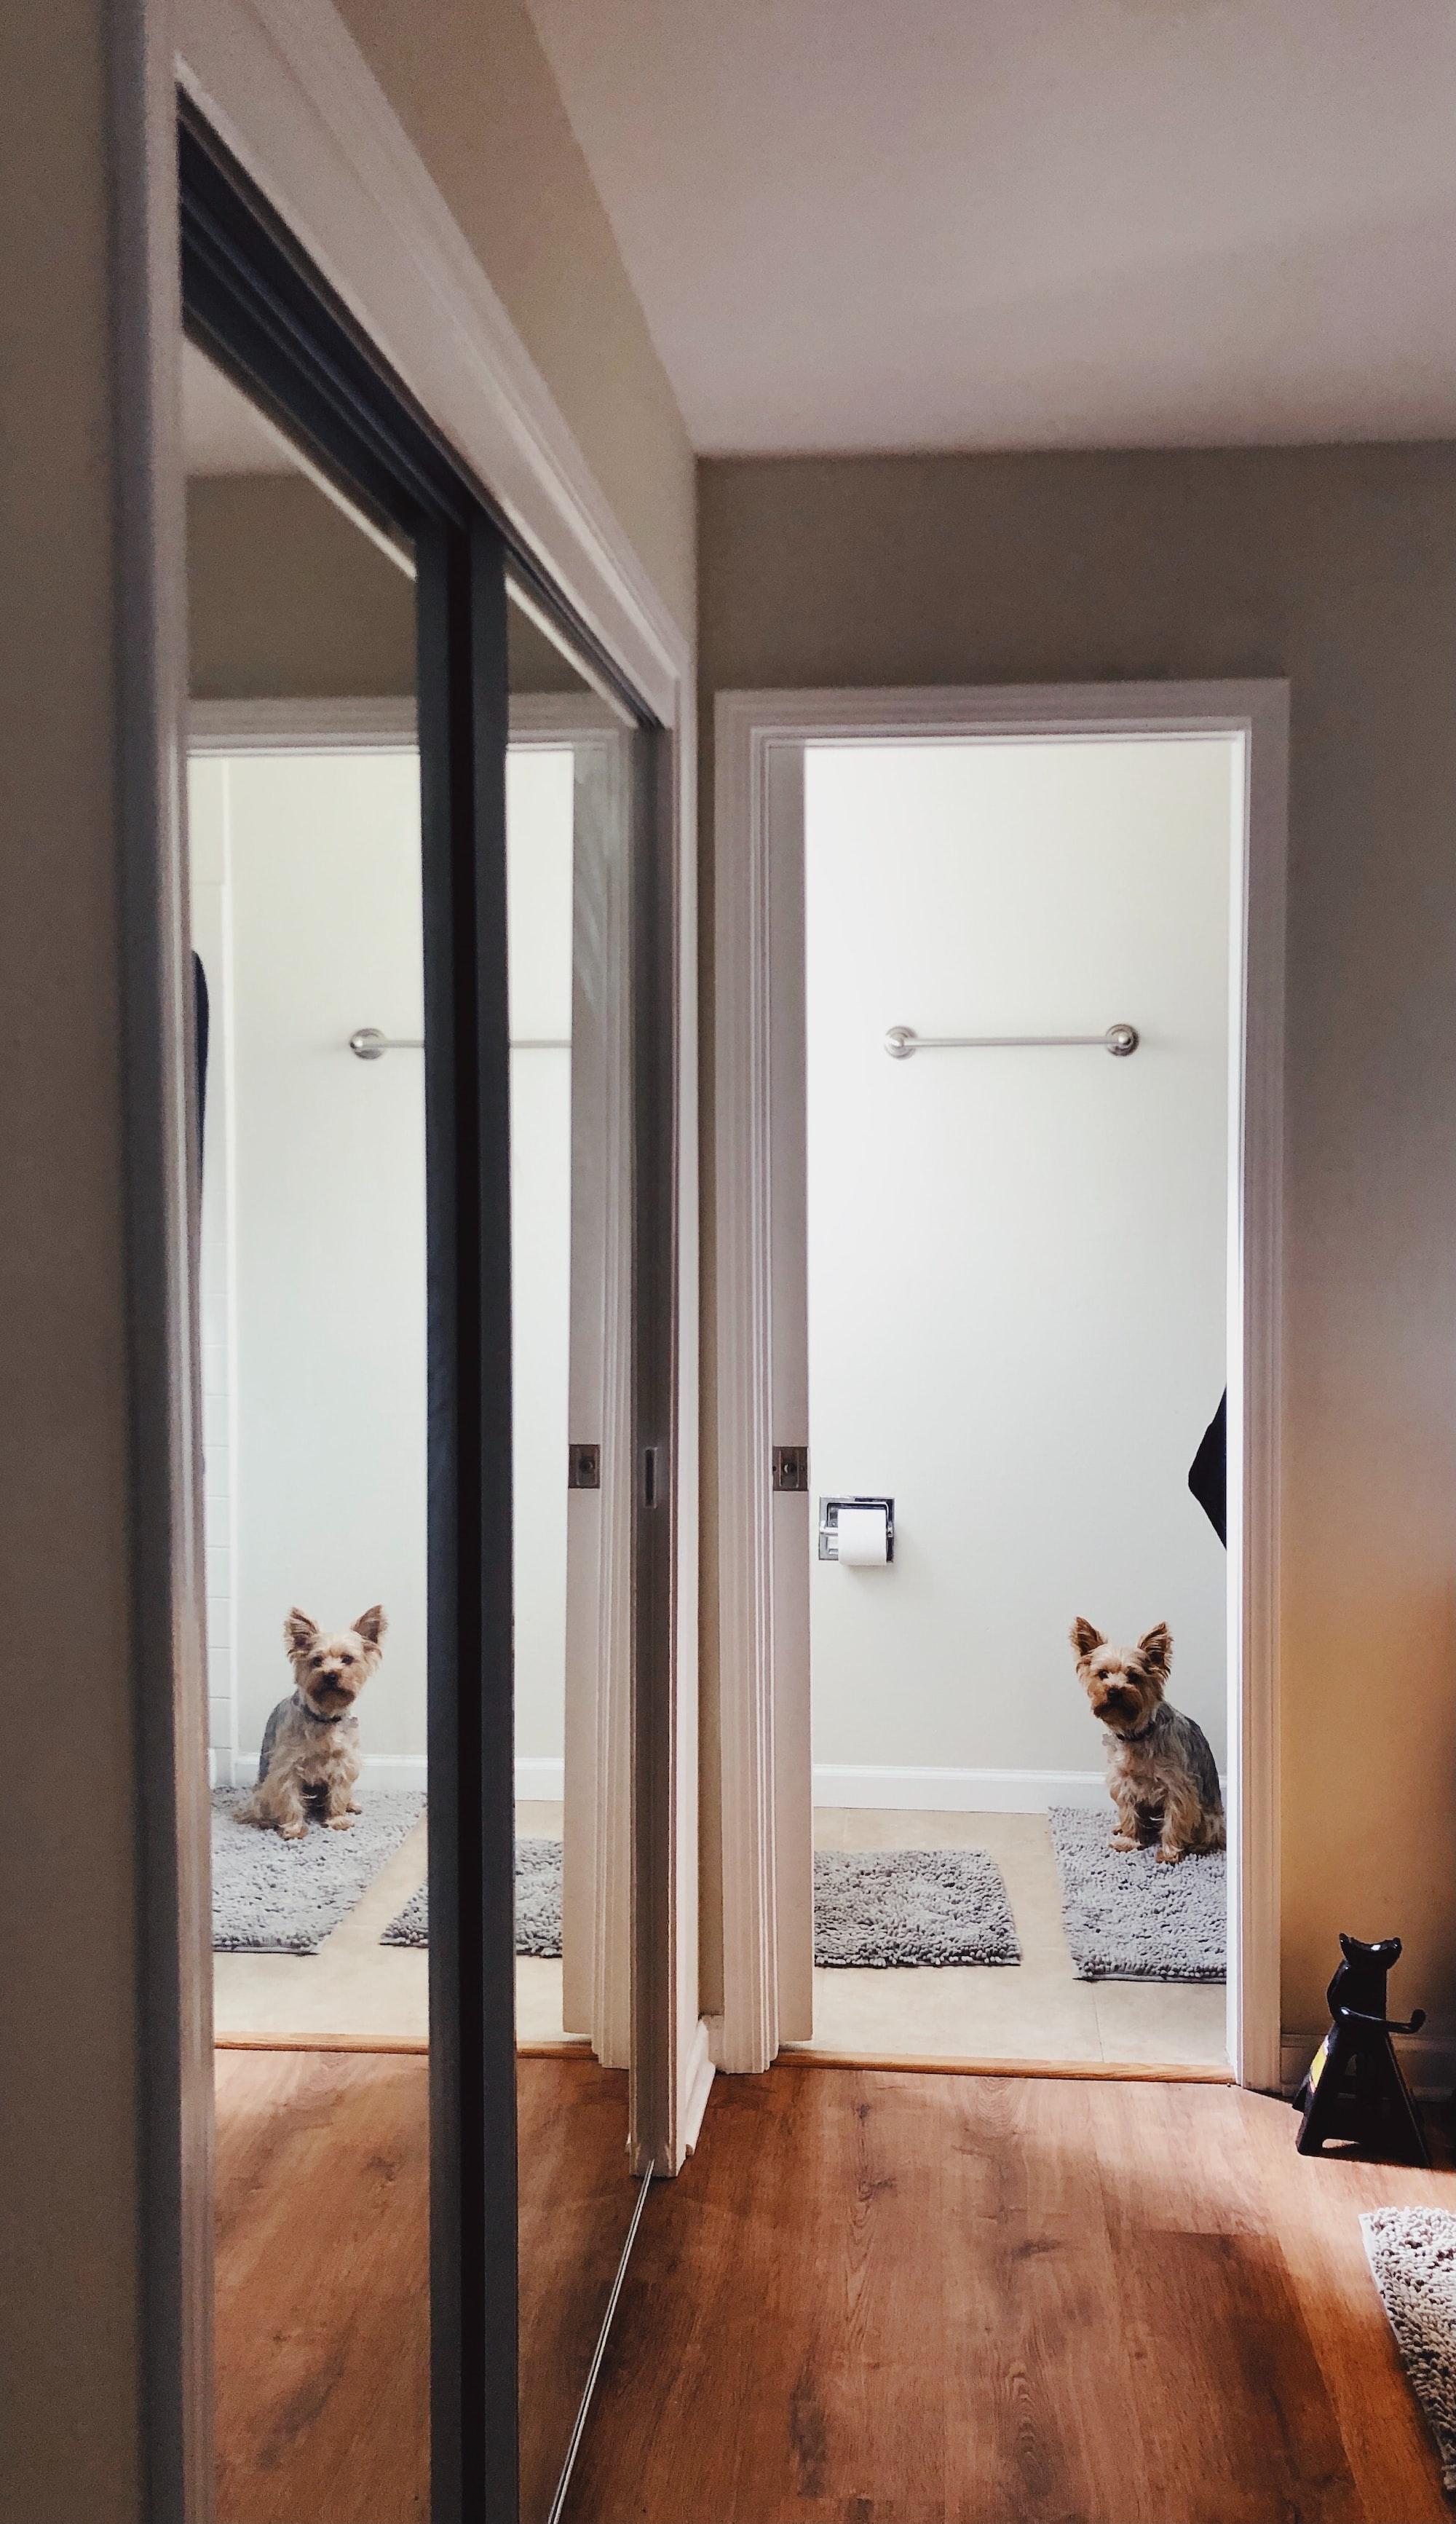 Why Your Dog Follows You Into The Bathroom: Behavior Explained